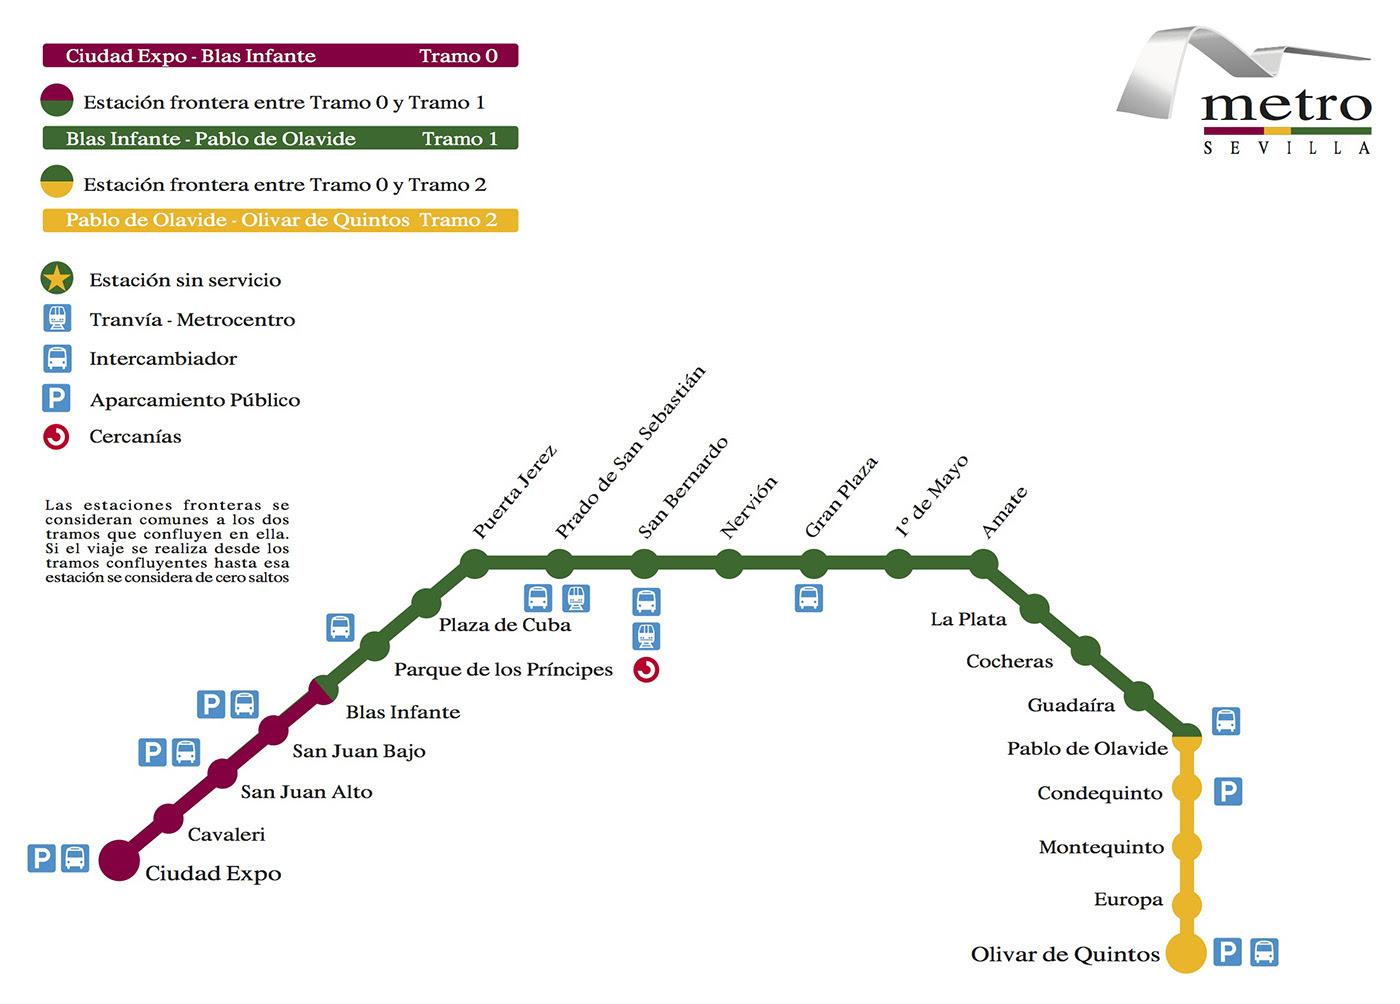 Plano de Metro de Sevilla 2017